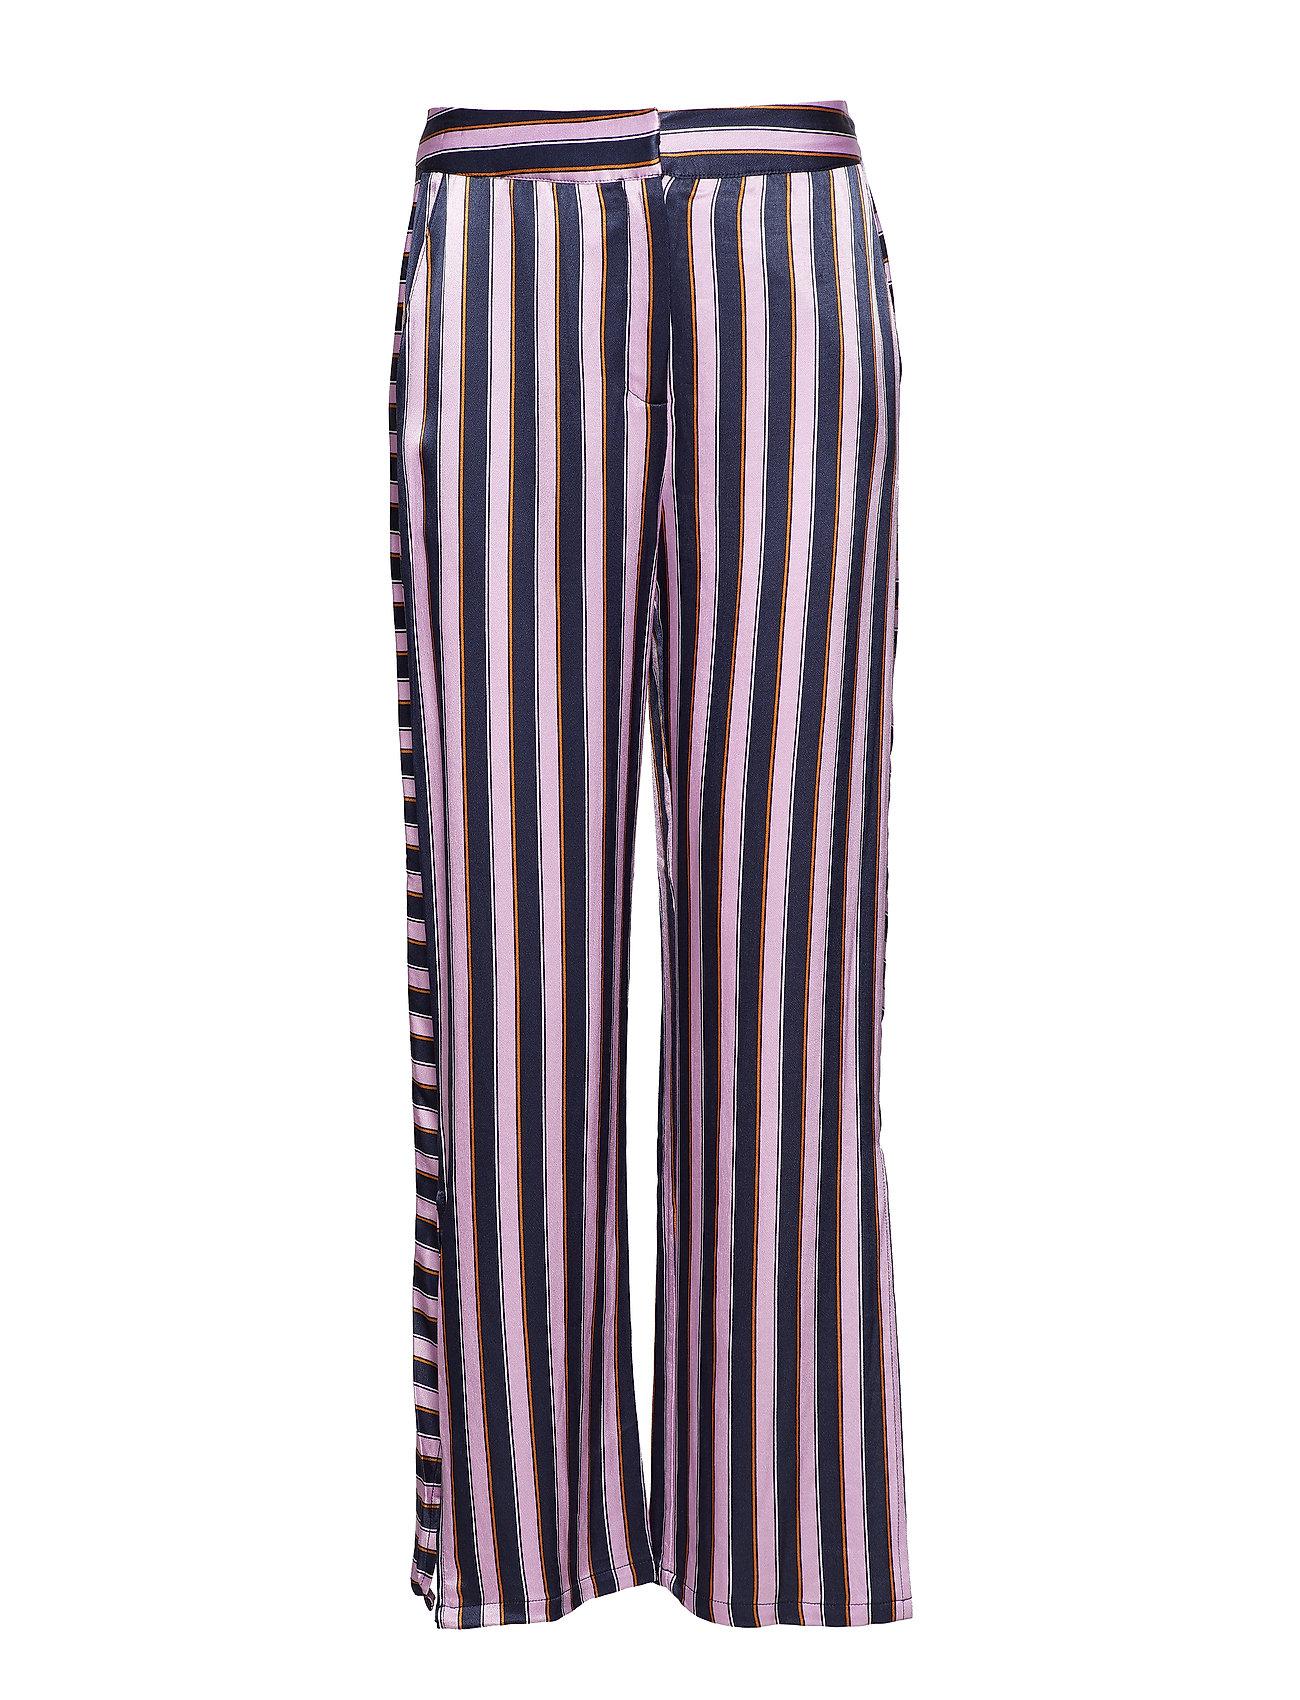 StripeNotes Josephine Nord Josephine Du Pantsmidnight Pantsmidnight 8nkP0wO